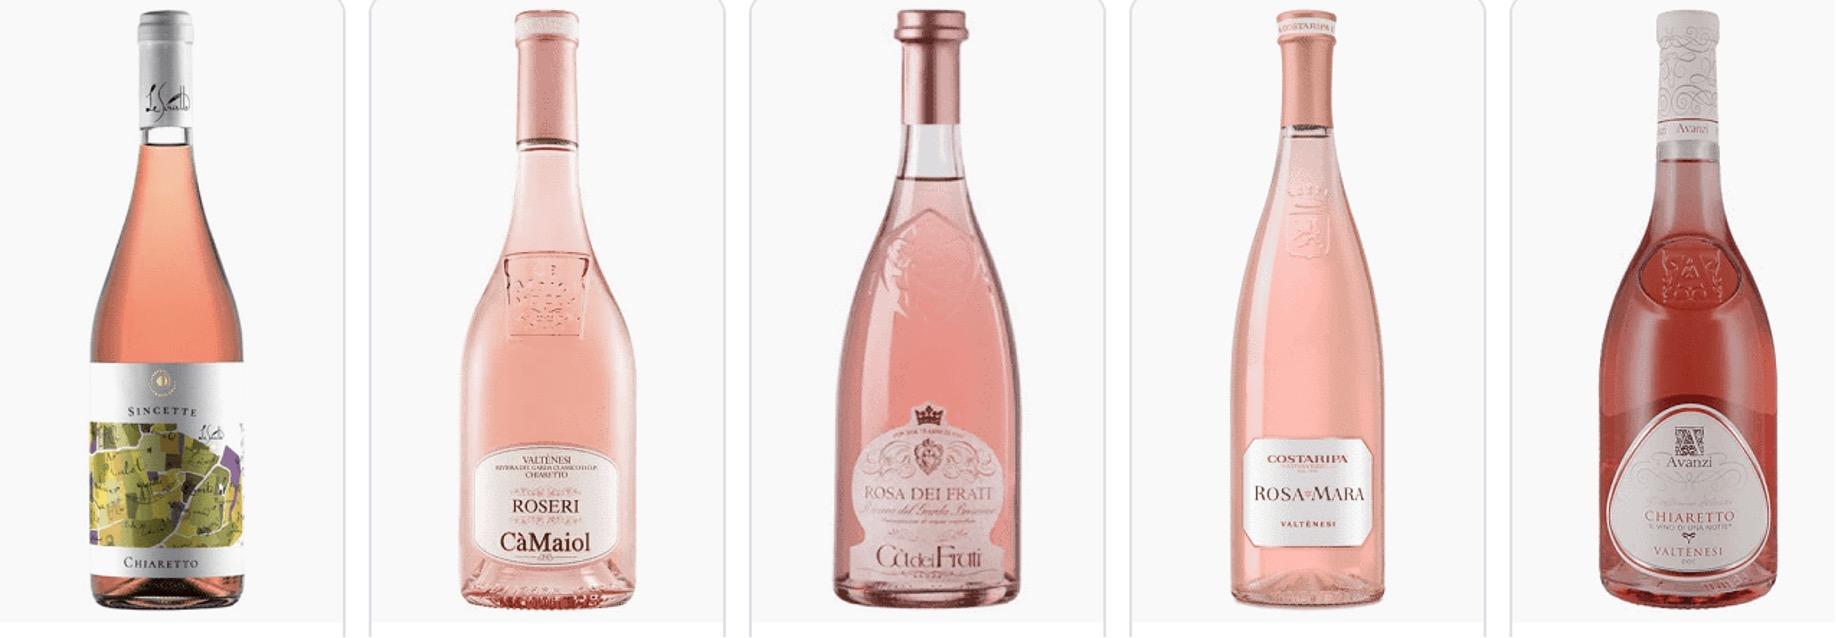 Valtenesi bottles of rosato. Photos courtesy of producers